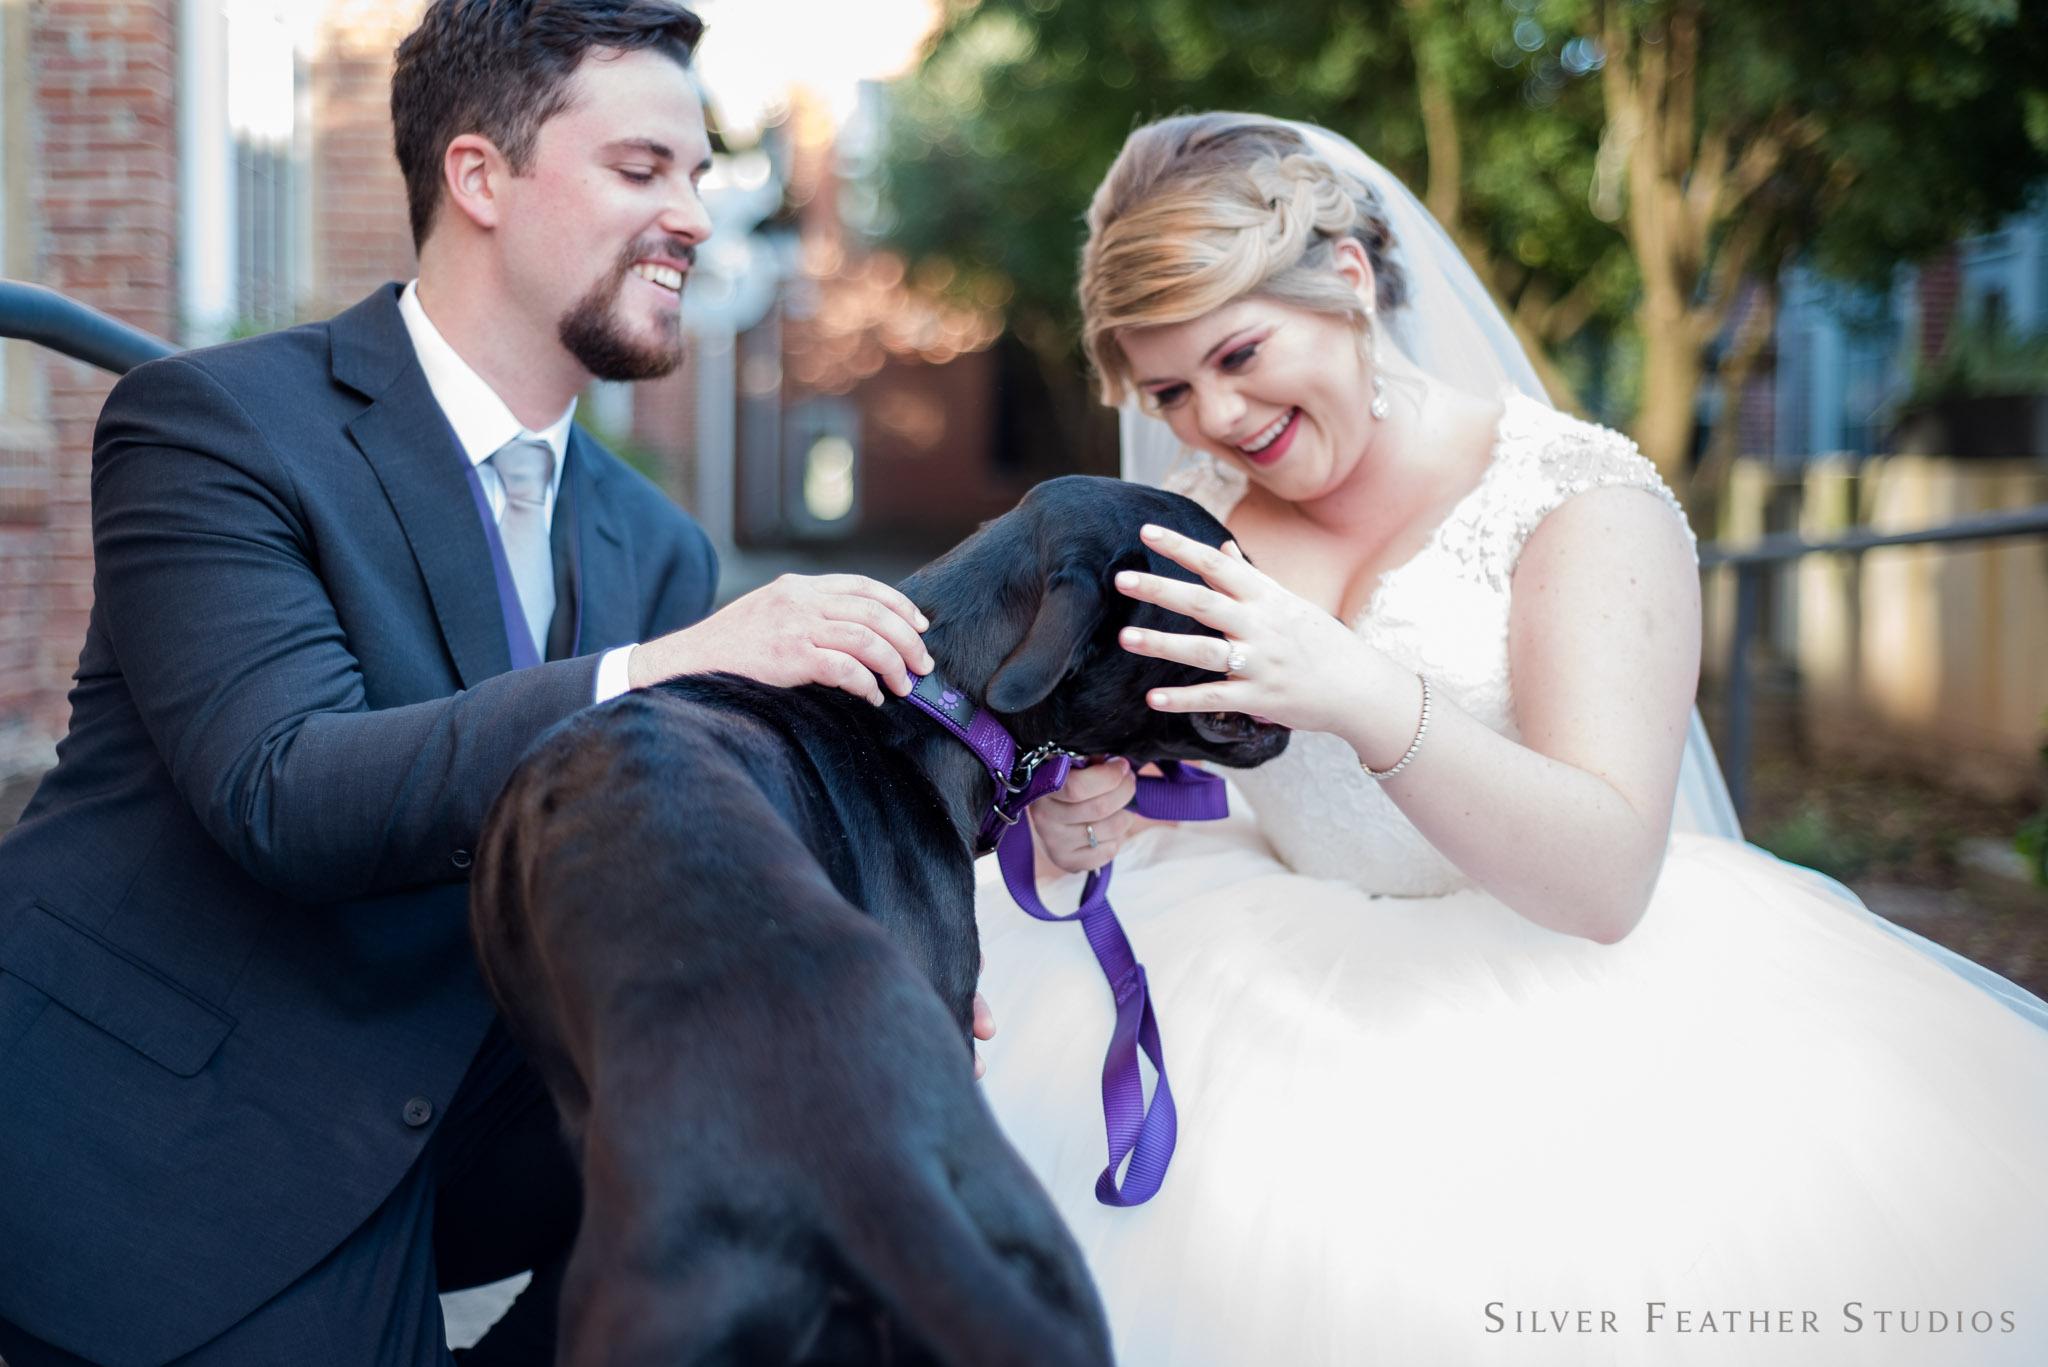 cottom-room-wedding-photography-015.jpg